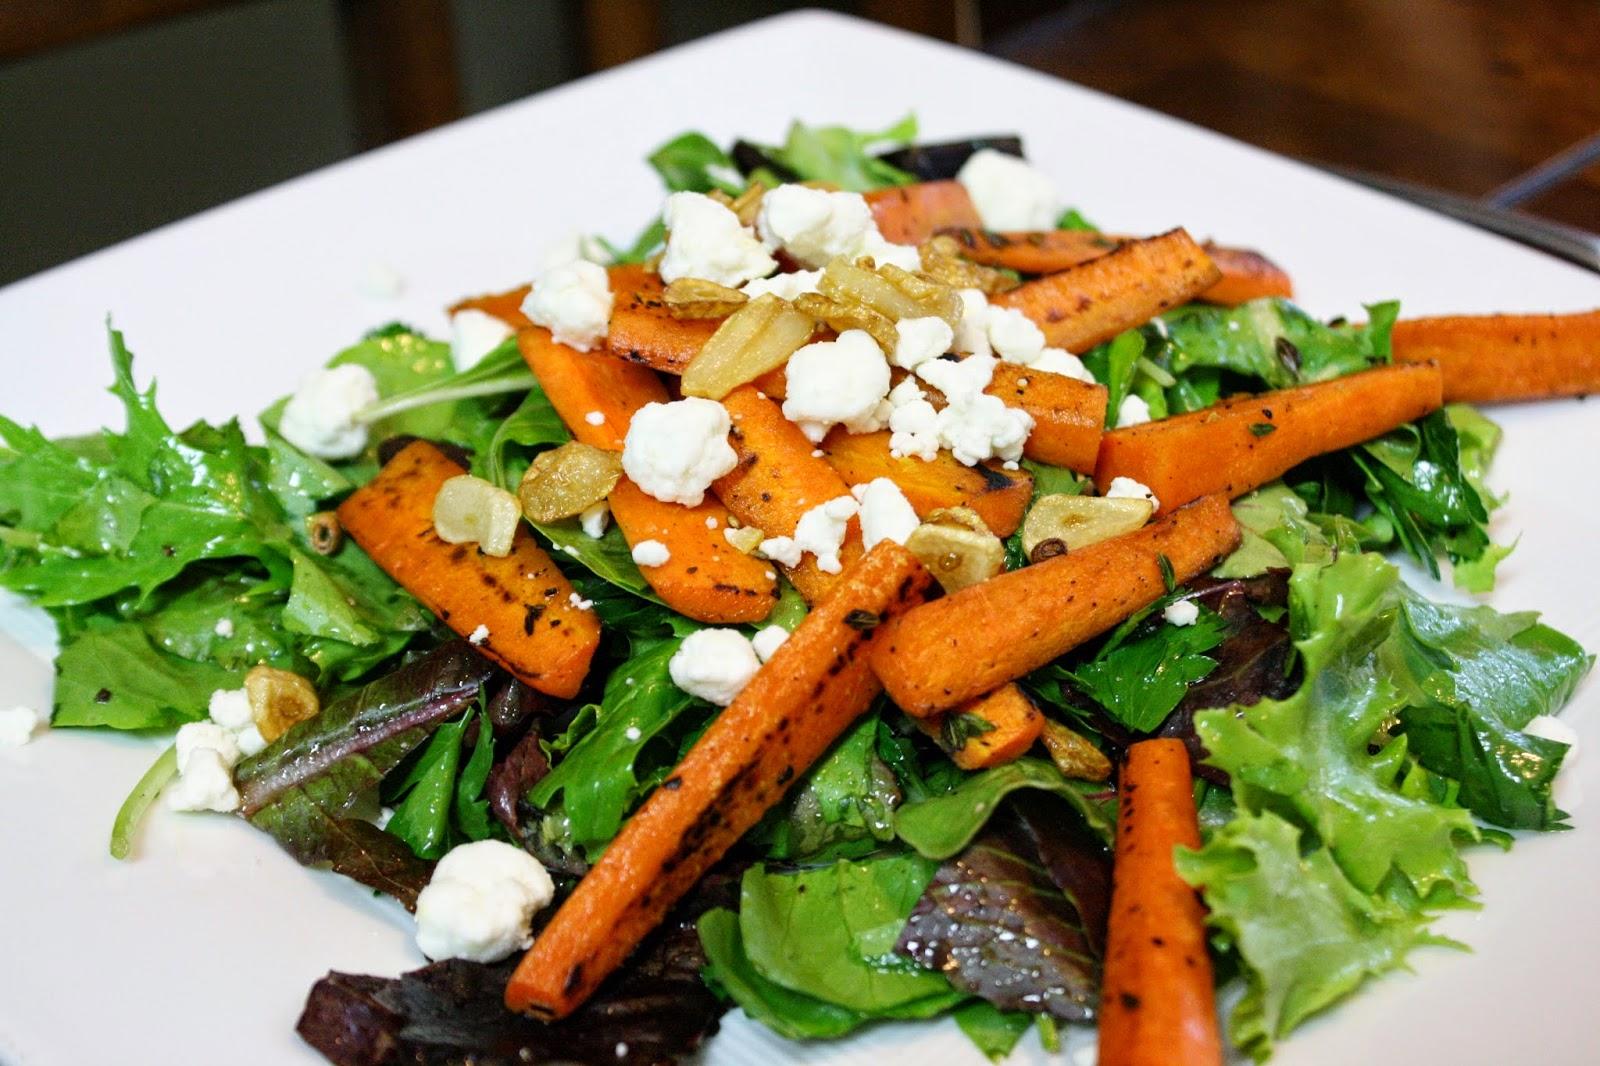 http://eatprayjuice.blogspot.com/2014/07/arugula-salad-with-carrots-and-garlic.html